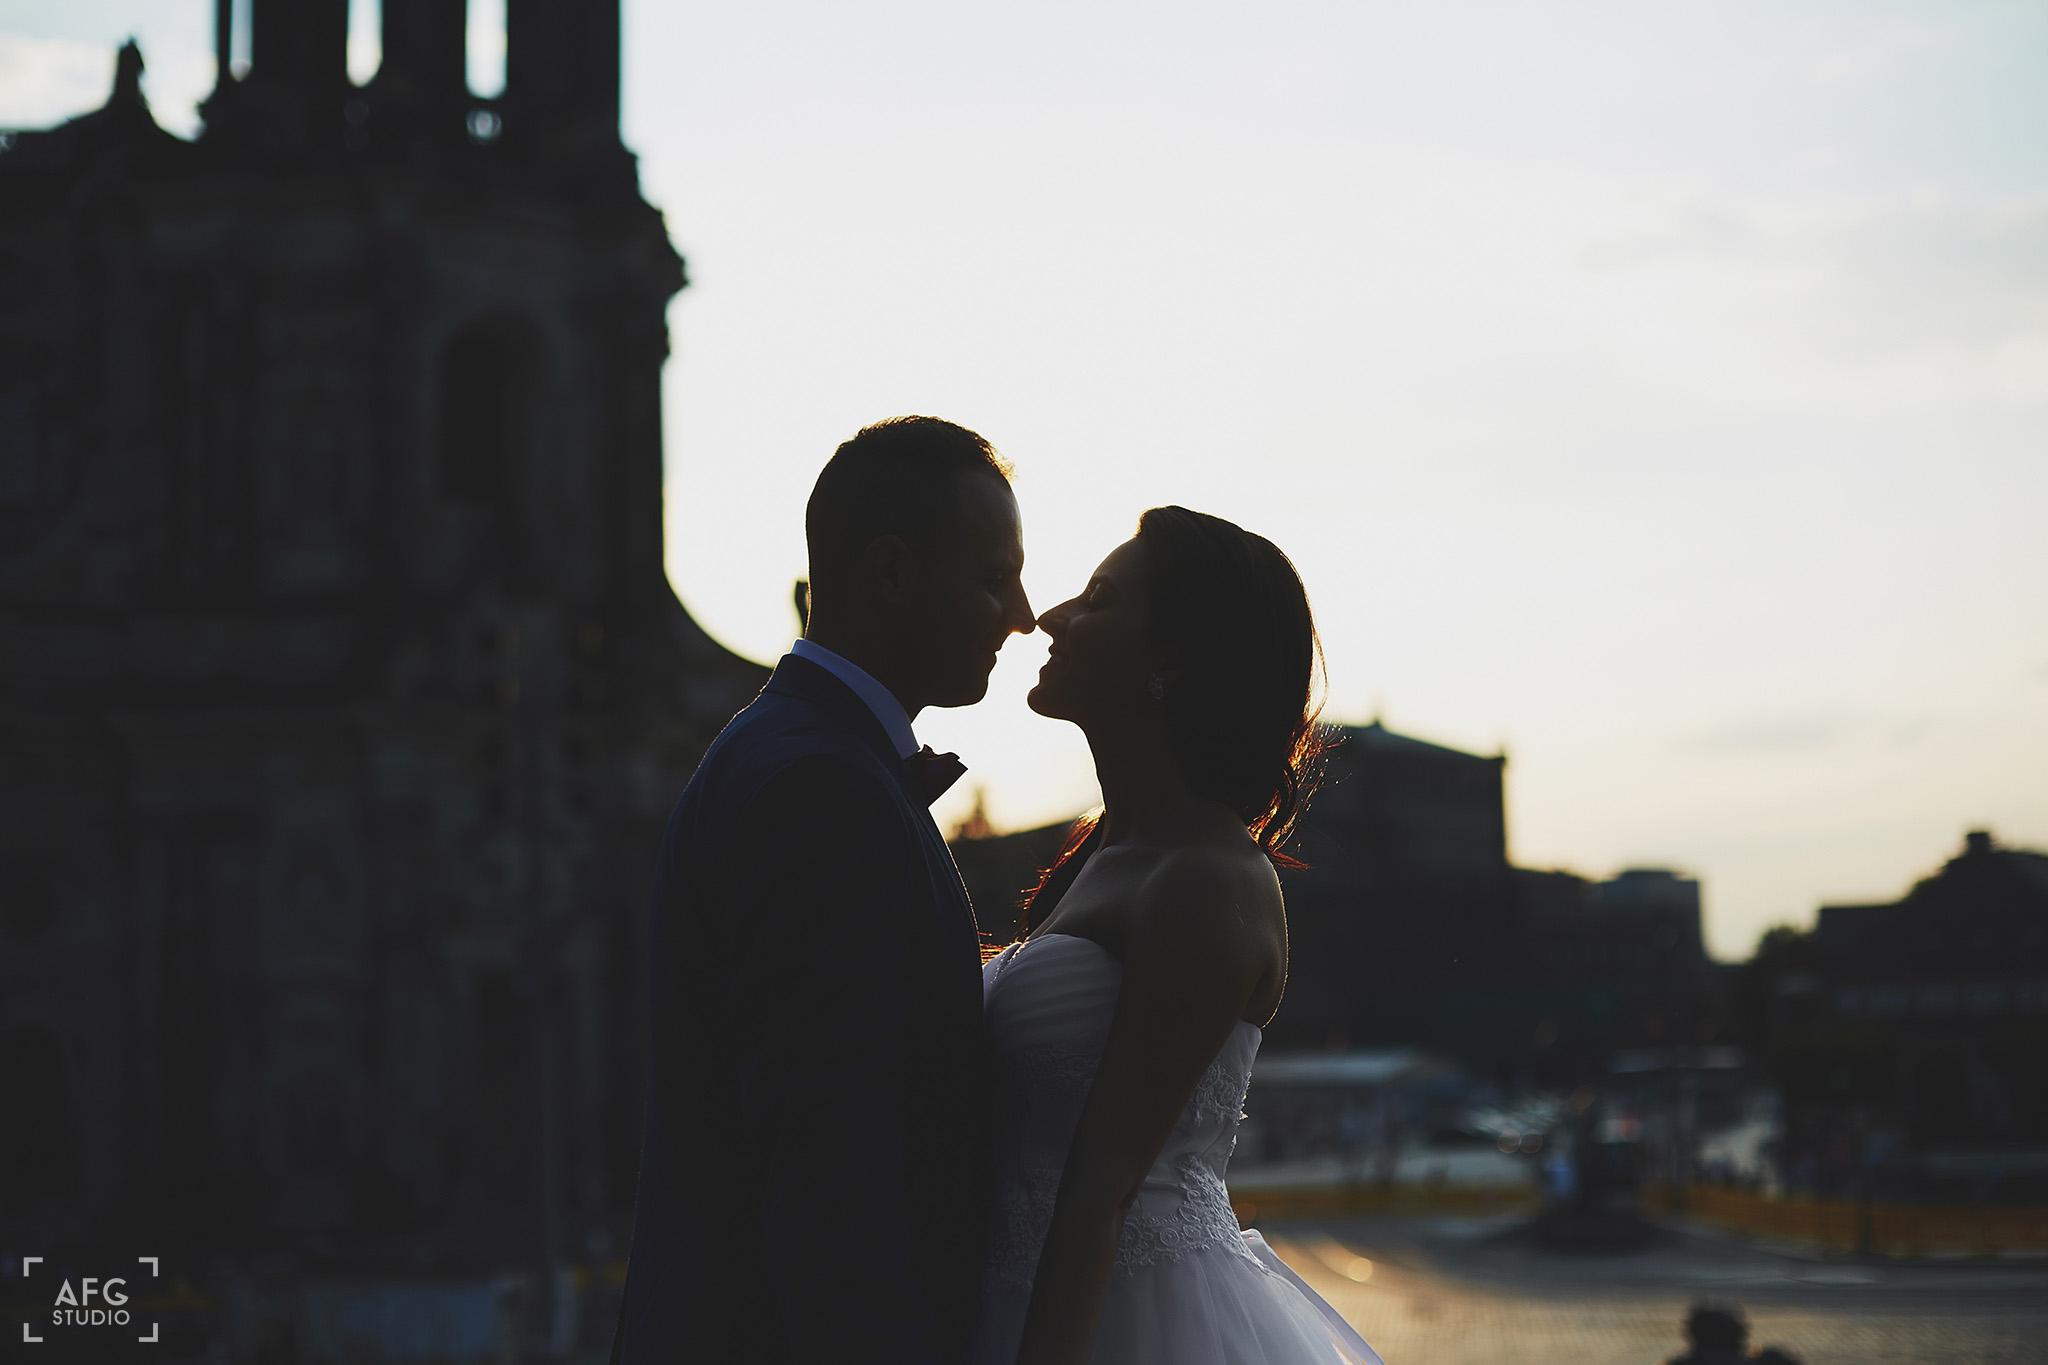 młoda para, zamek, zachód słońca